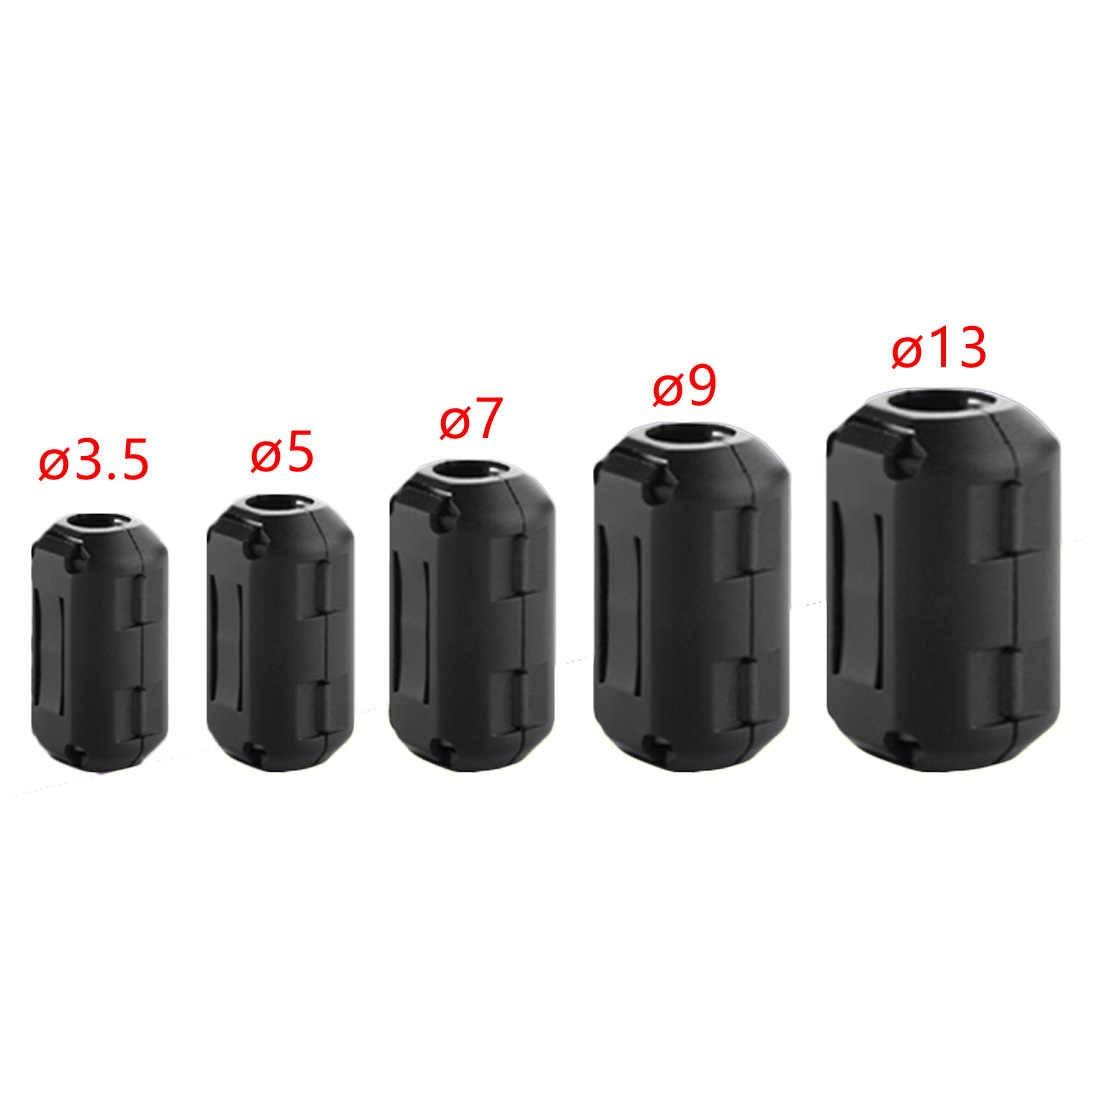 5pcs 3.5 millimetri Nero Cavo Nucleo di Ferrite Filtro Nichel-zinco Noise Suppressor per la EMI RFI Clip Choke di Ferrite filtri